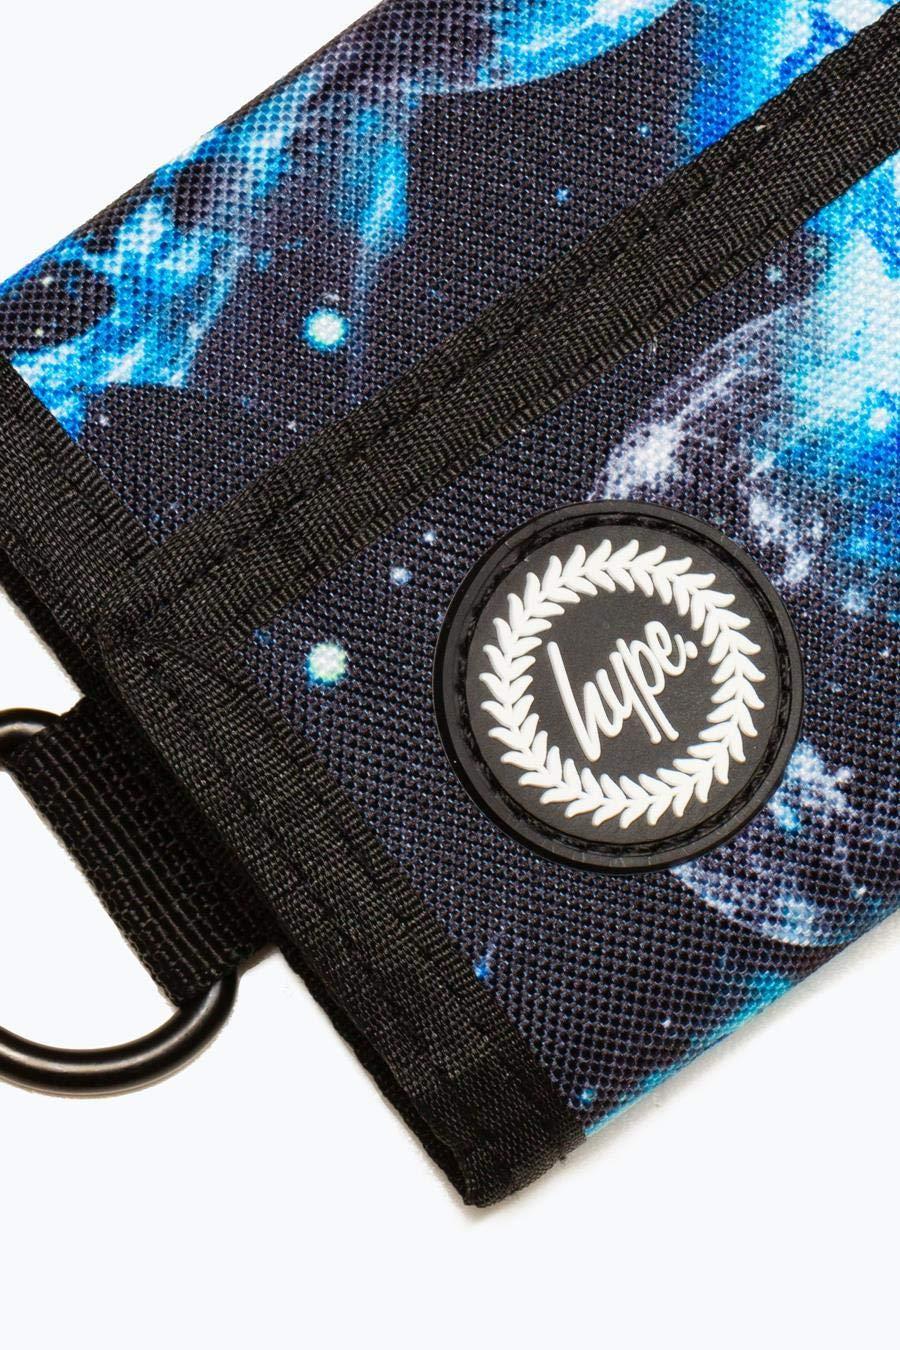 Hype Blue Moons Wallet